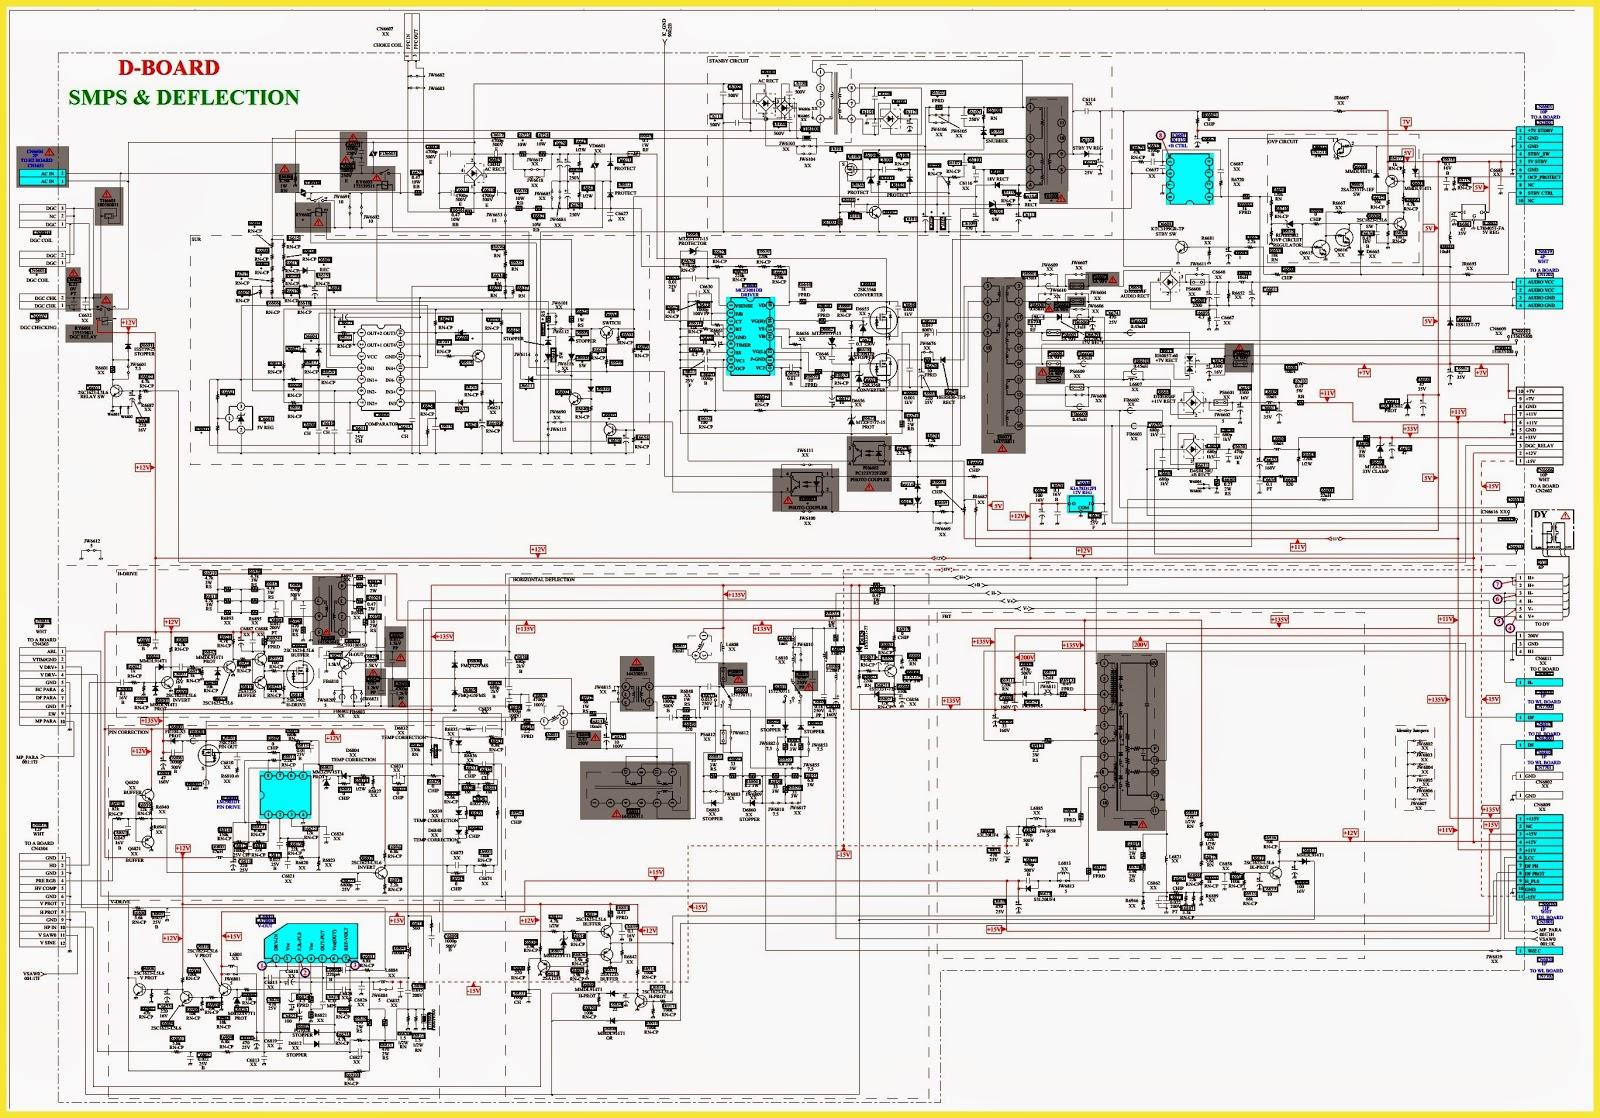 medium resolution of samsung dvd wiring diagram wiring library samsung usb cable wiring diagram samsung dvd wiring diagram